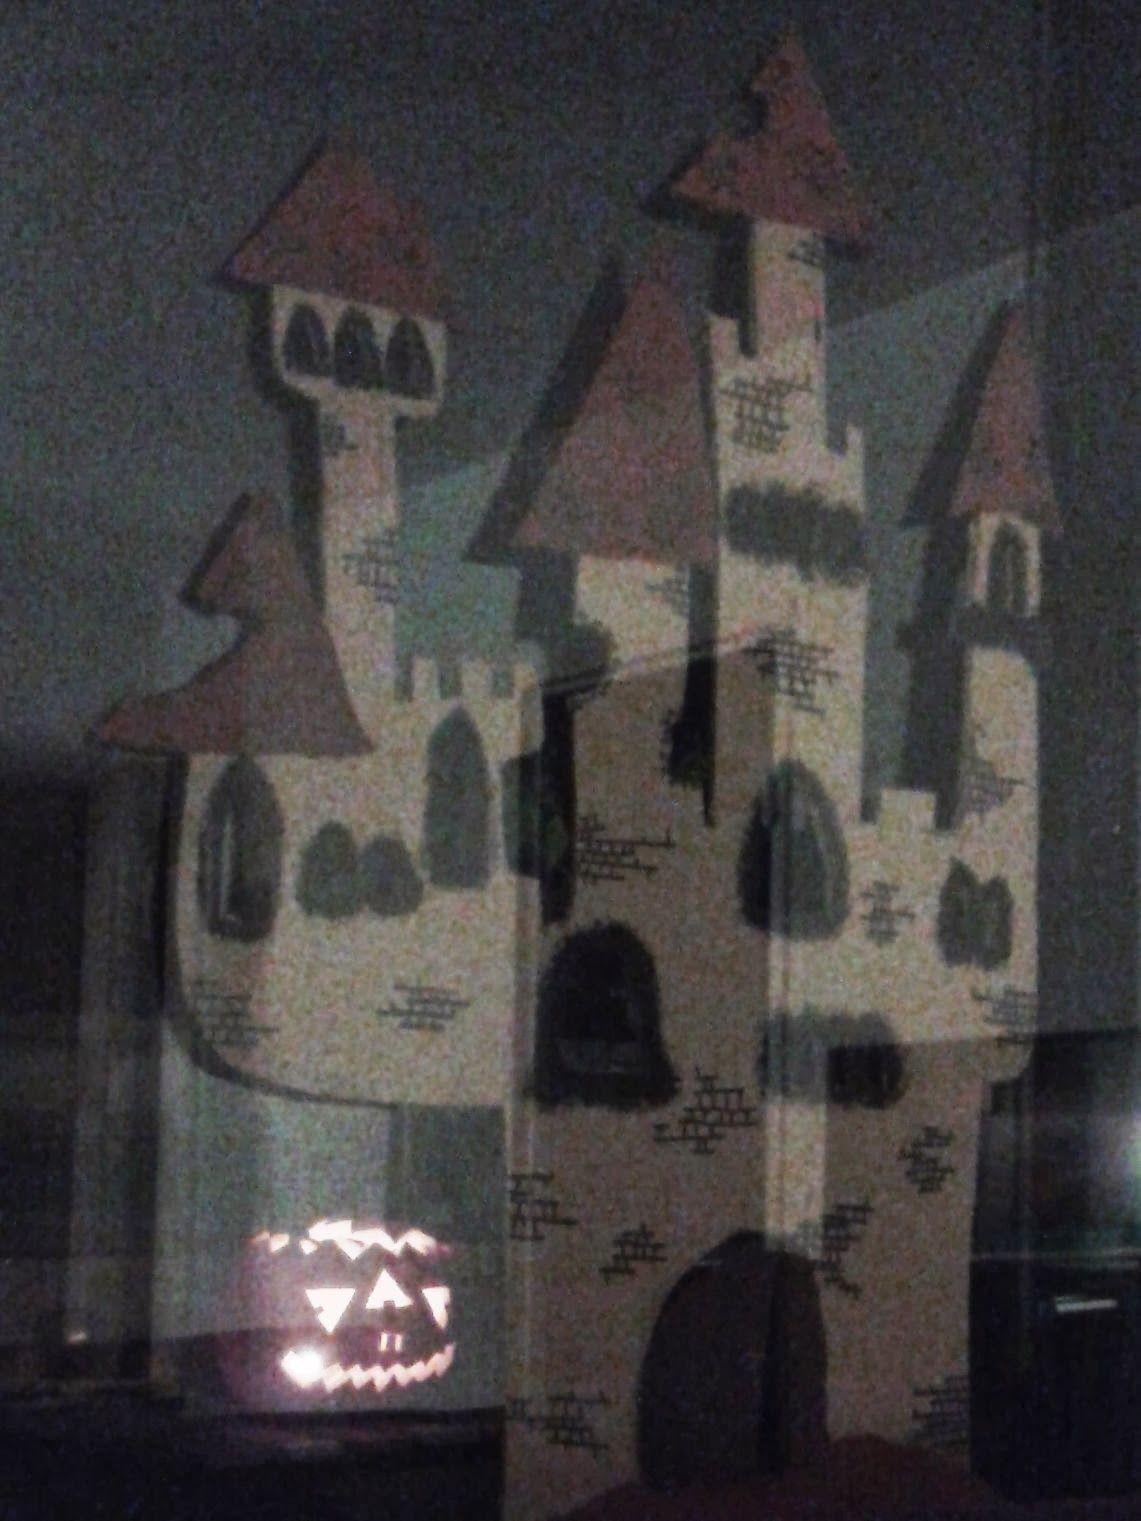 Bazooka Crafts 12 Days of Halloween 3 Eyed Carved Pumpkin